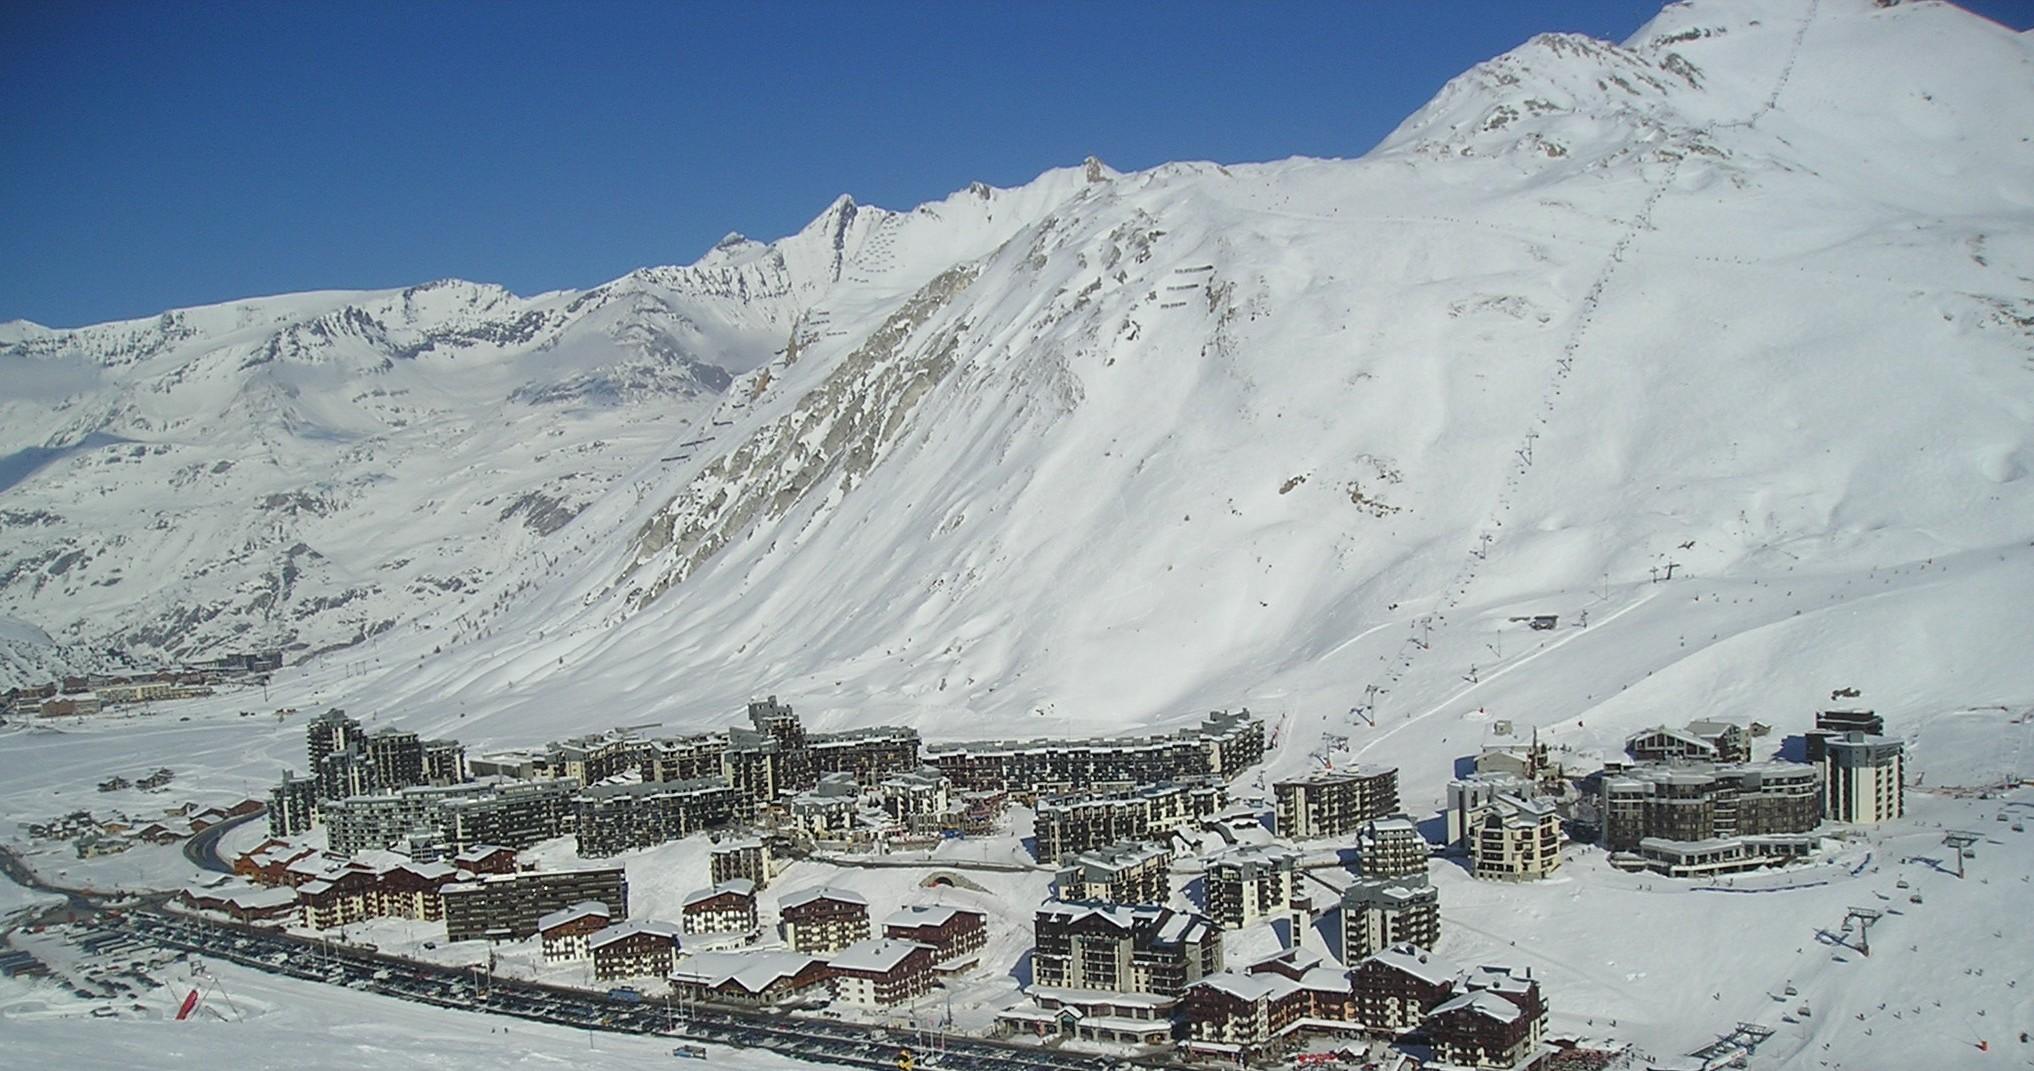 skier tignes station des alpes du nord domaine de tignes val d is re. Black Bedroom Furniture Sets. Home Design Ideas